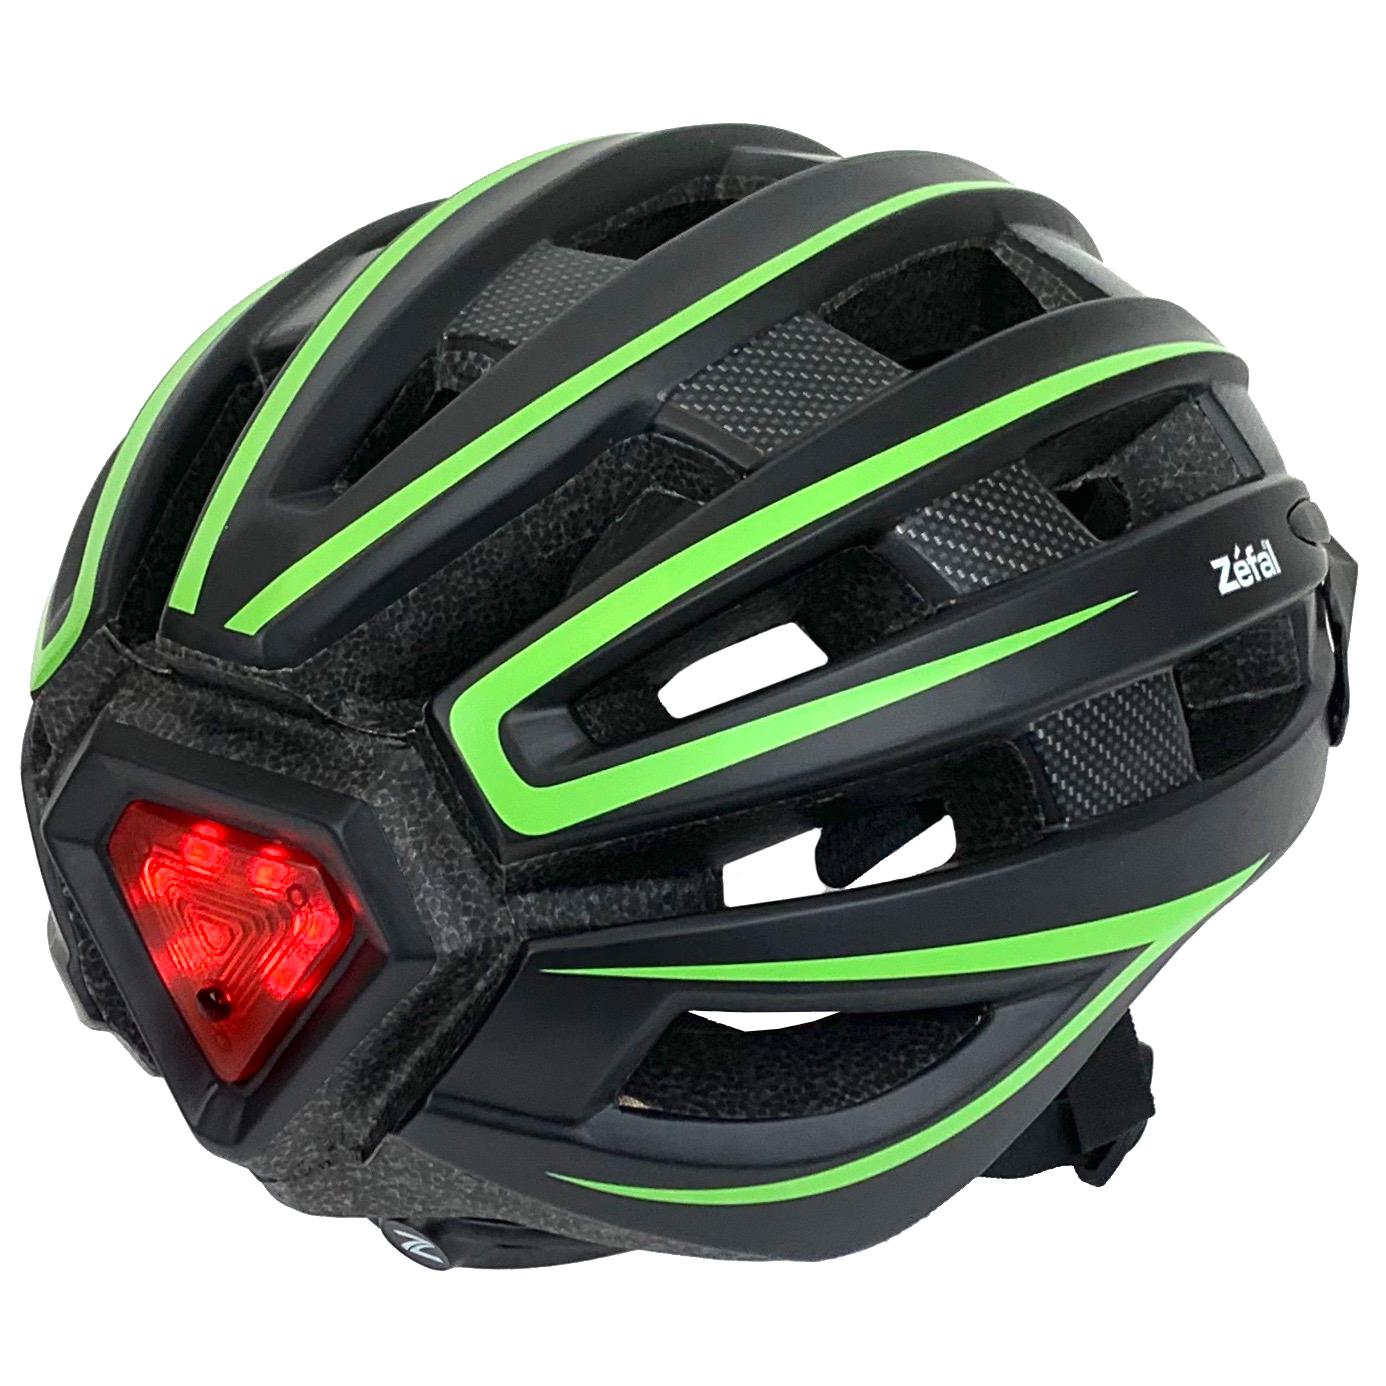 Bike Helmet Light >> Zefal Adjustable Light Up Bicycle Helmet L 58 61cm Universal Dial